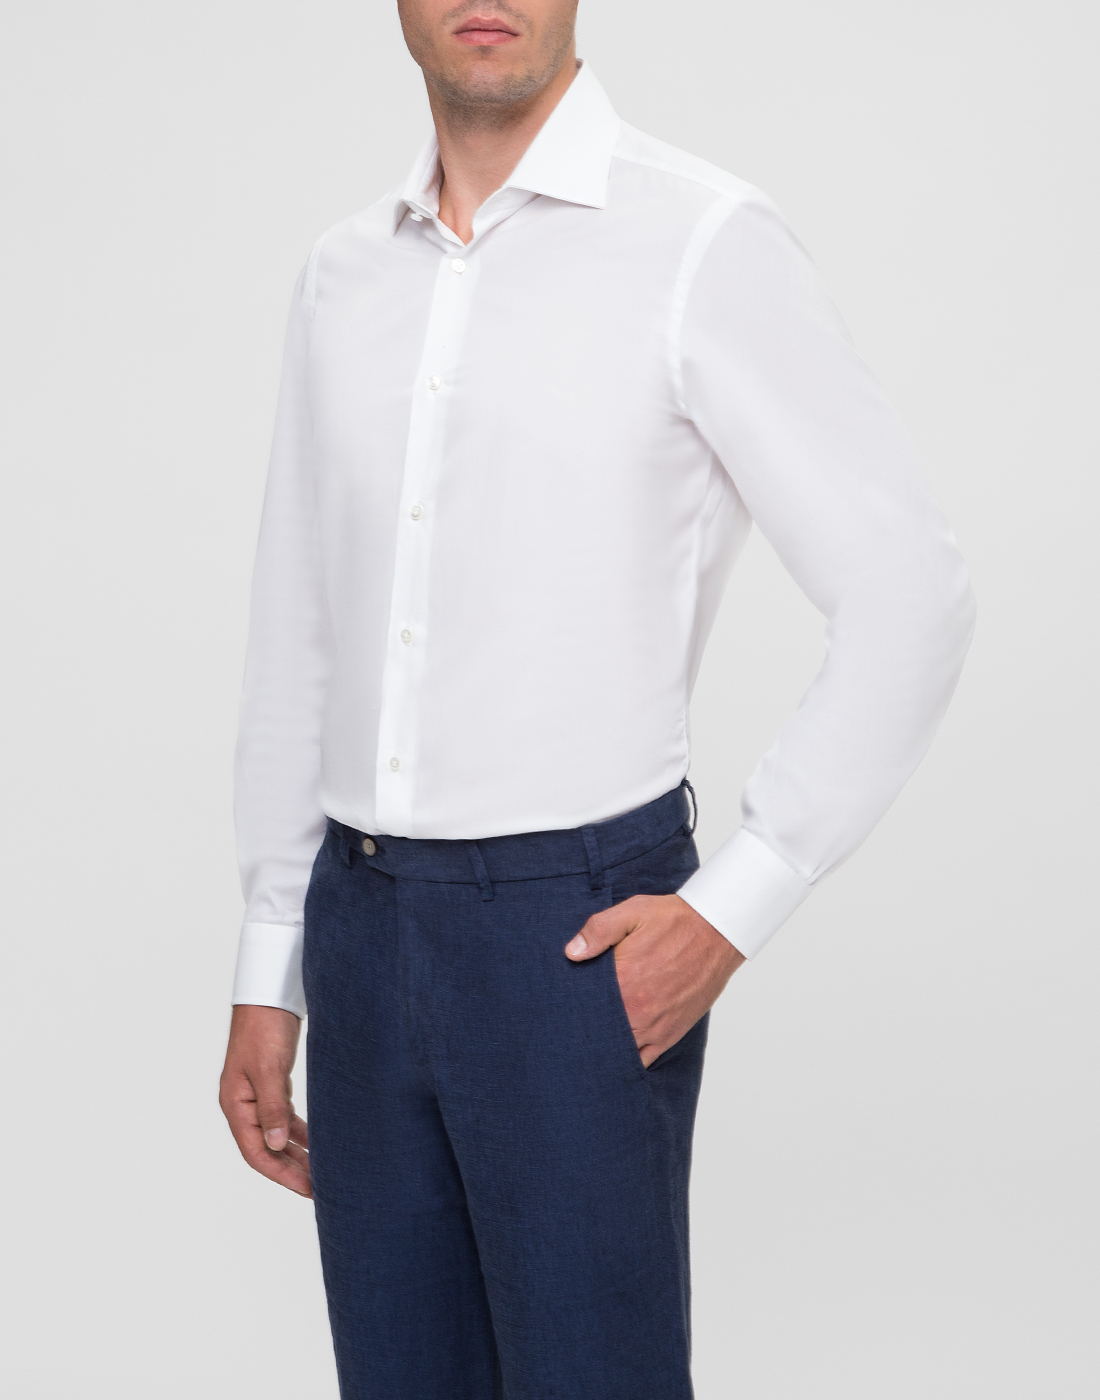 Мужская белая рубашка Barba SD2U634540301U-3